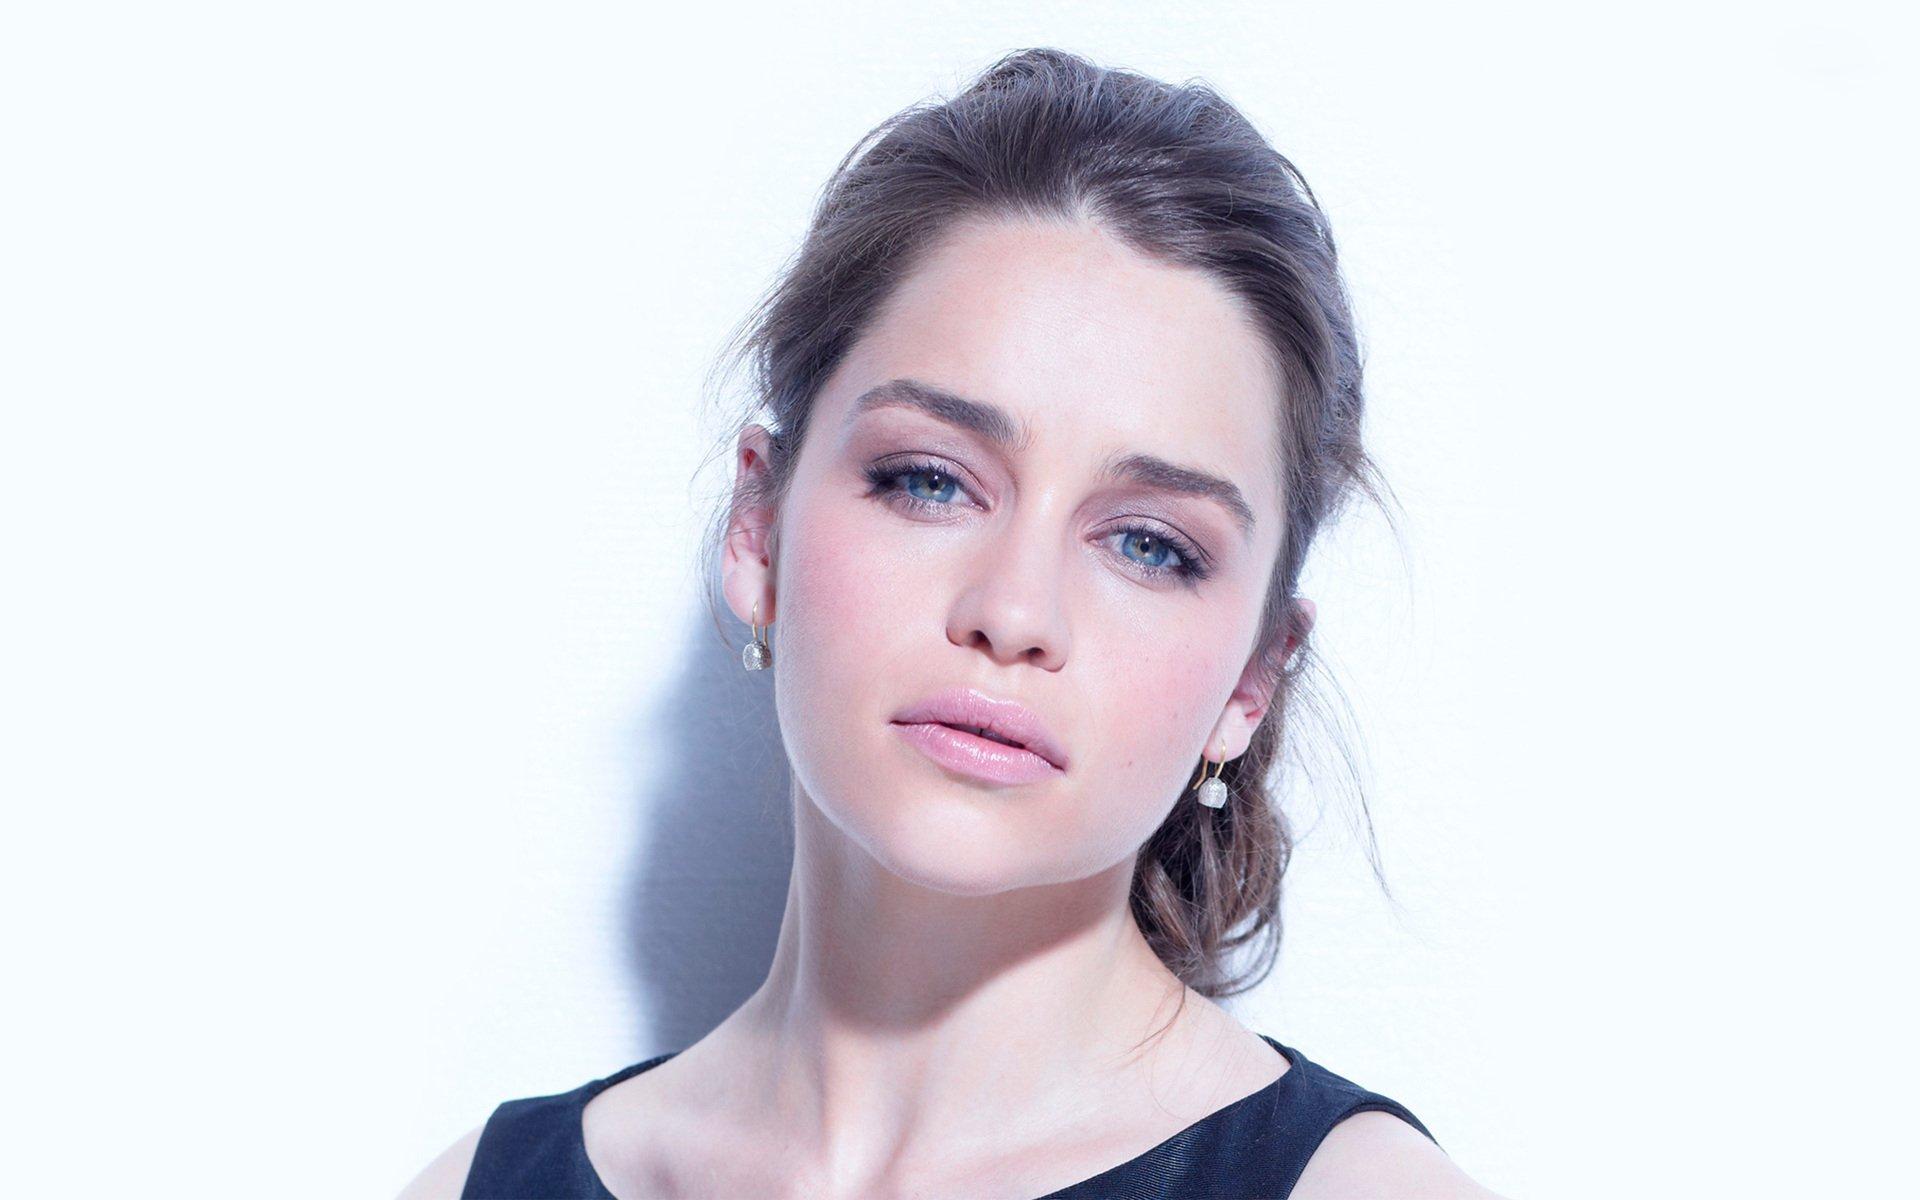 Celebrity - Emilia Clarke  Green Eyes Brunette English Actress Game Face Wallpaper